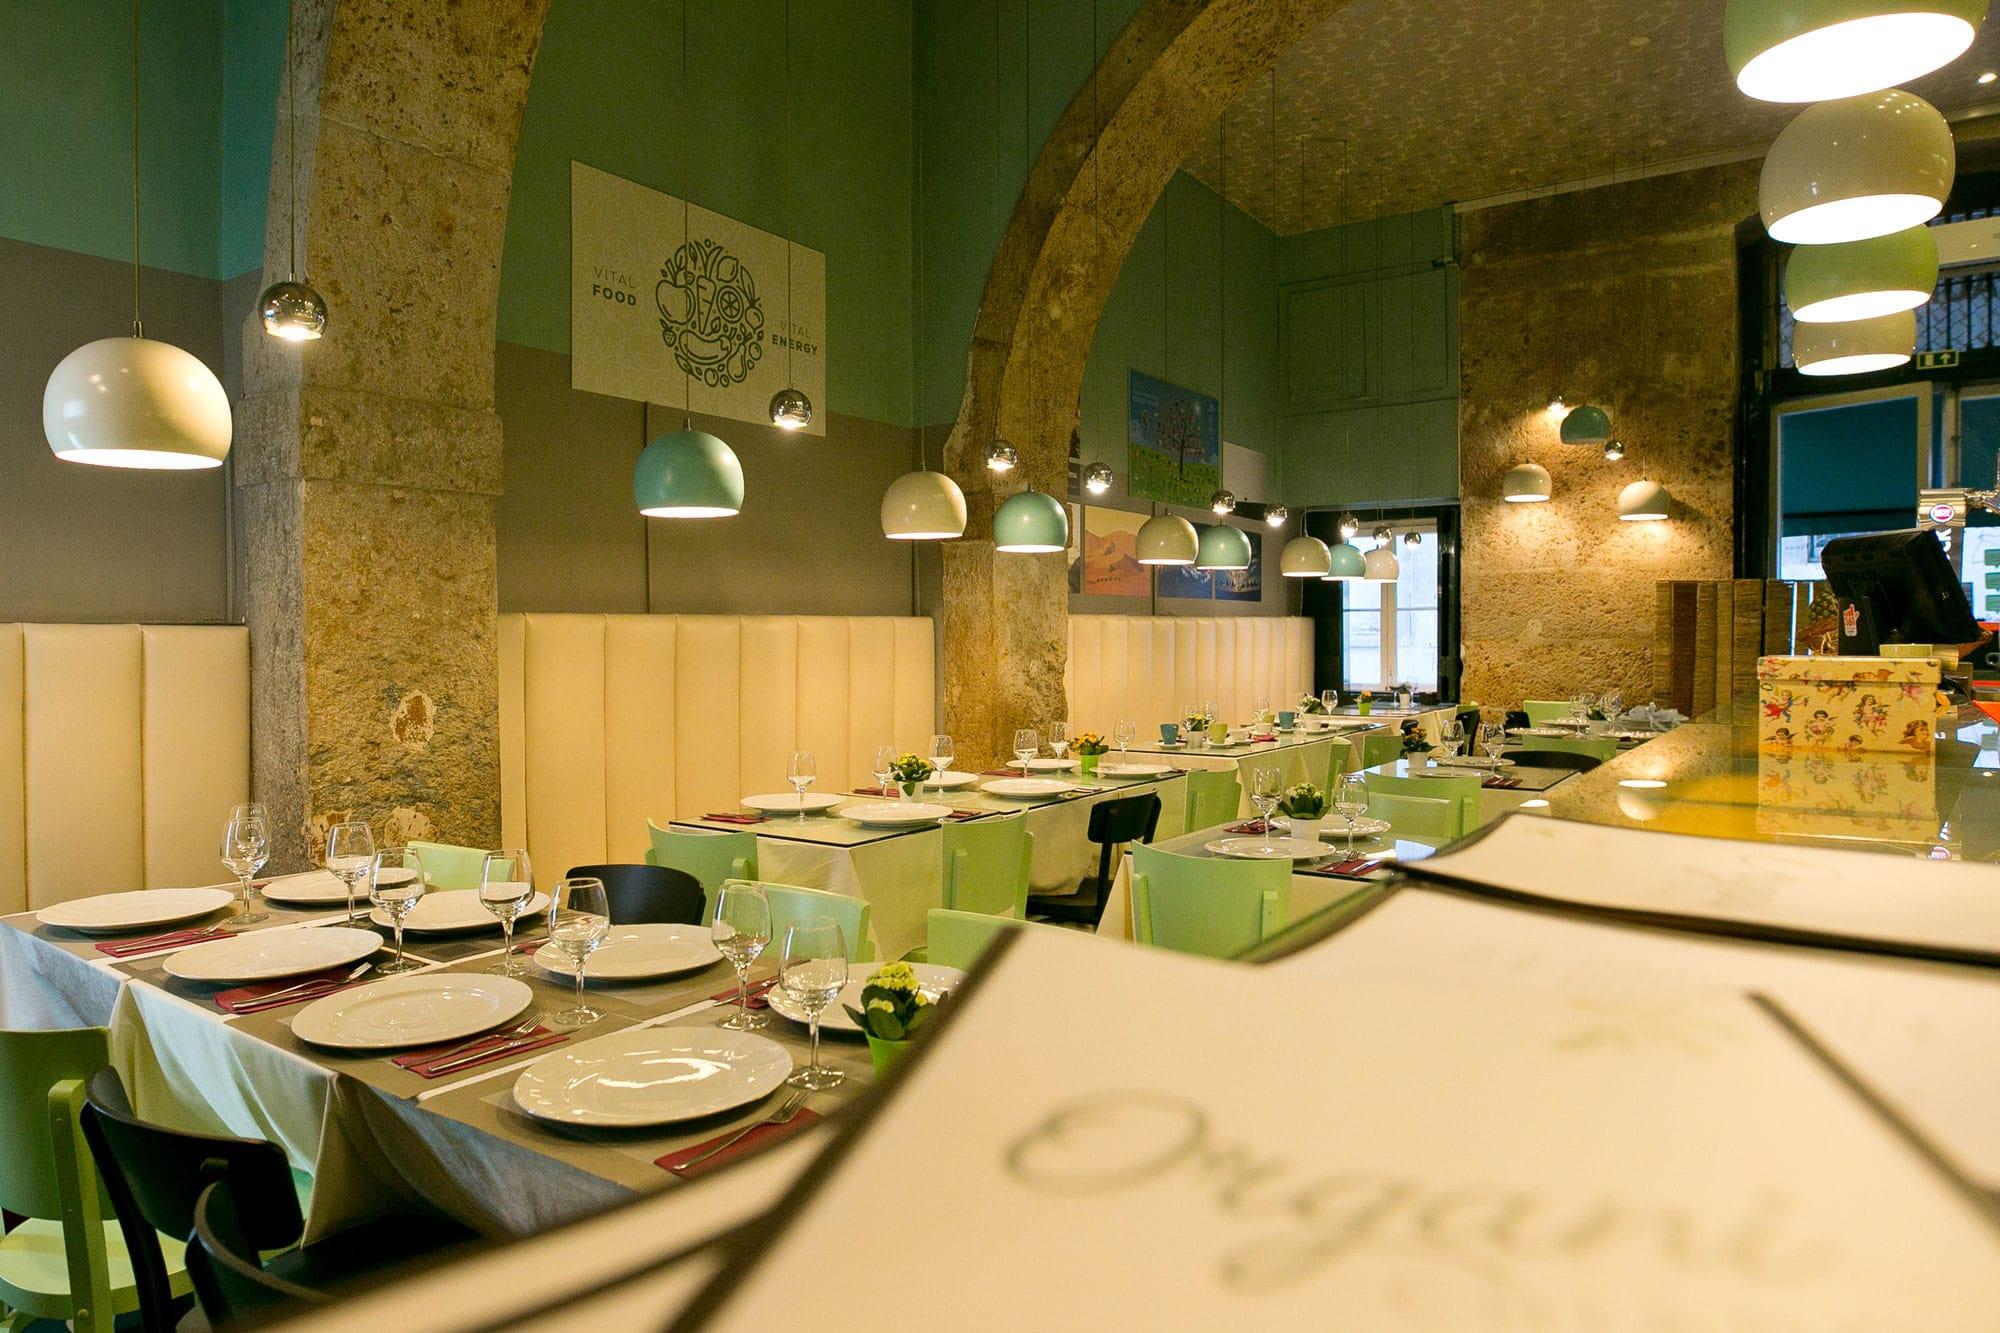 Restaurante Vegan Lisboa - Restaurante Vegan - Organi Chiado